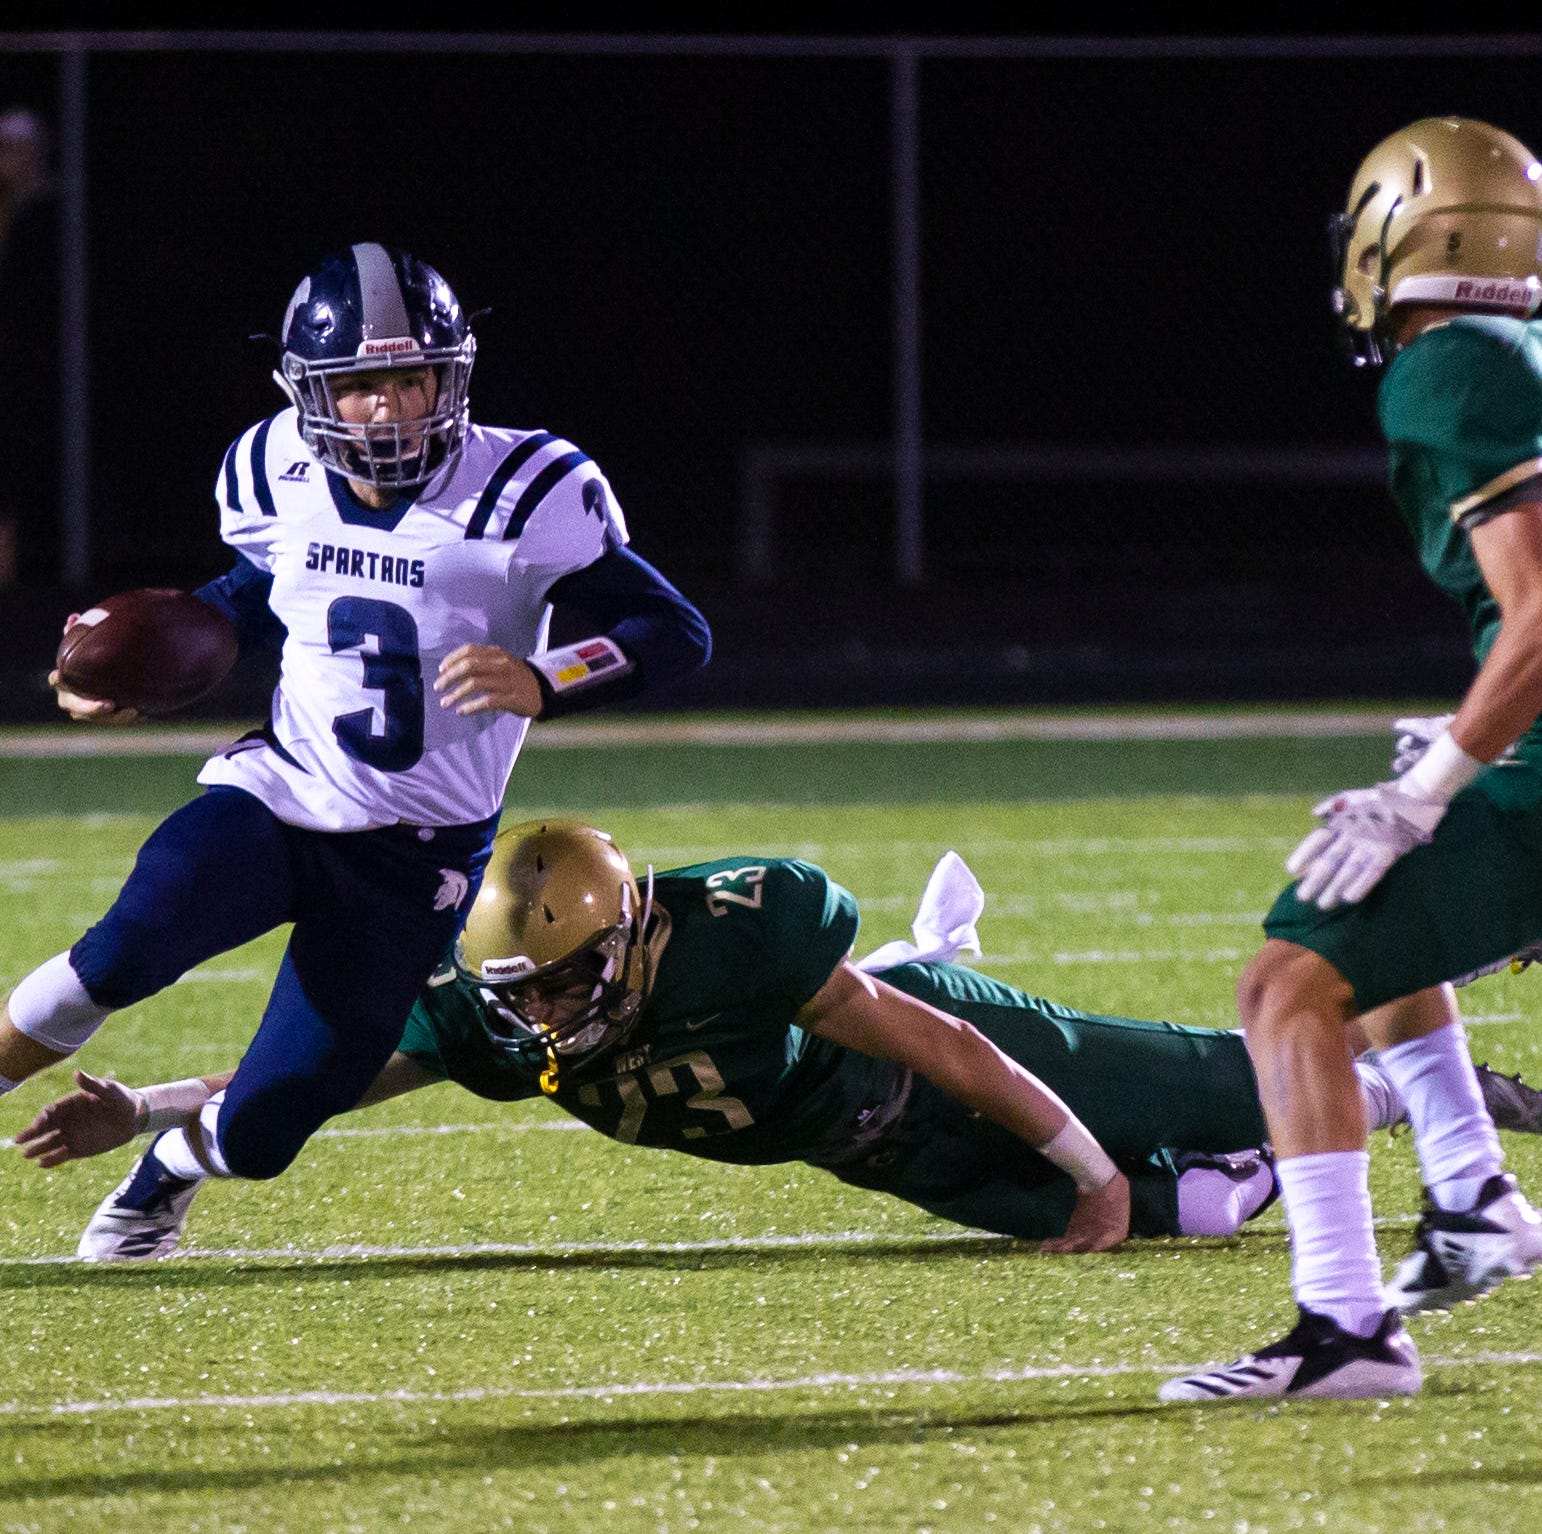 Iowa high school football: Final scores from Friday, Sept. 21